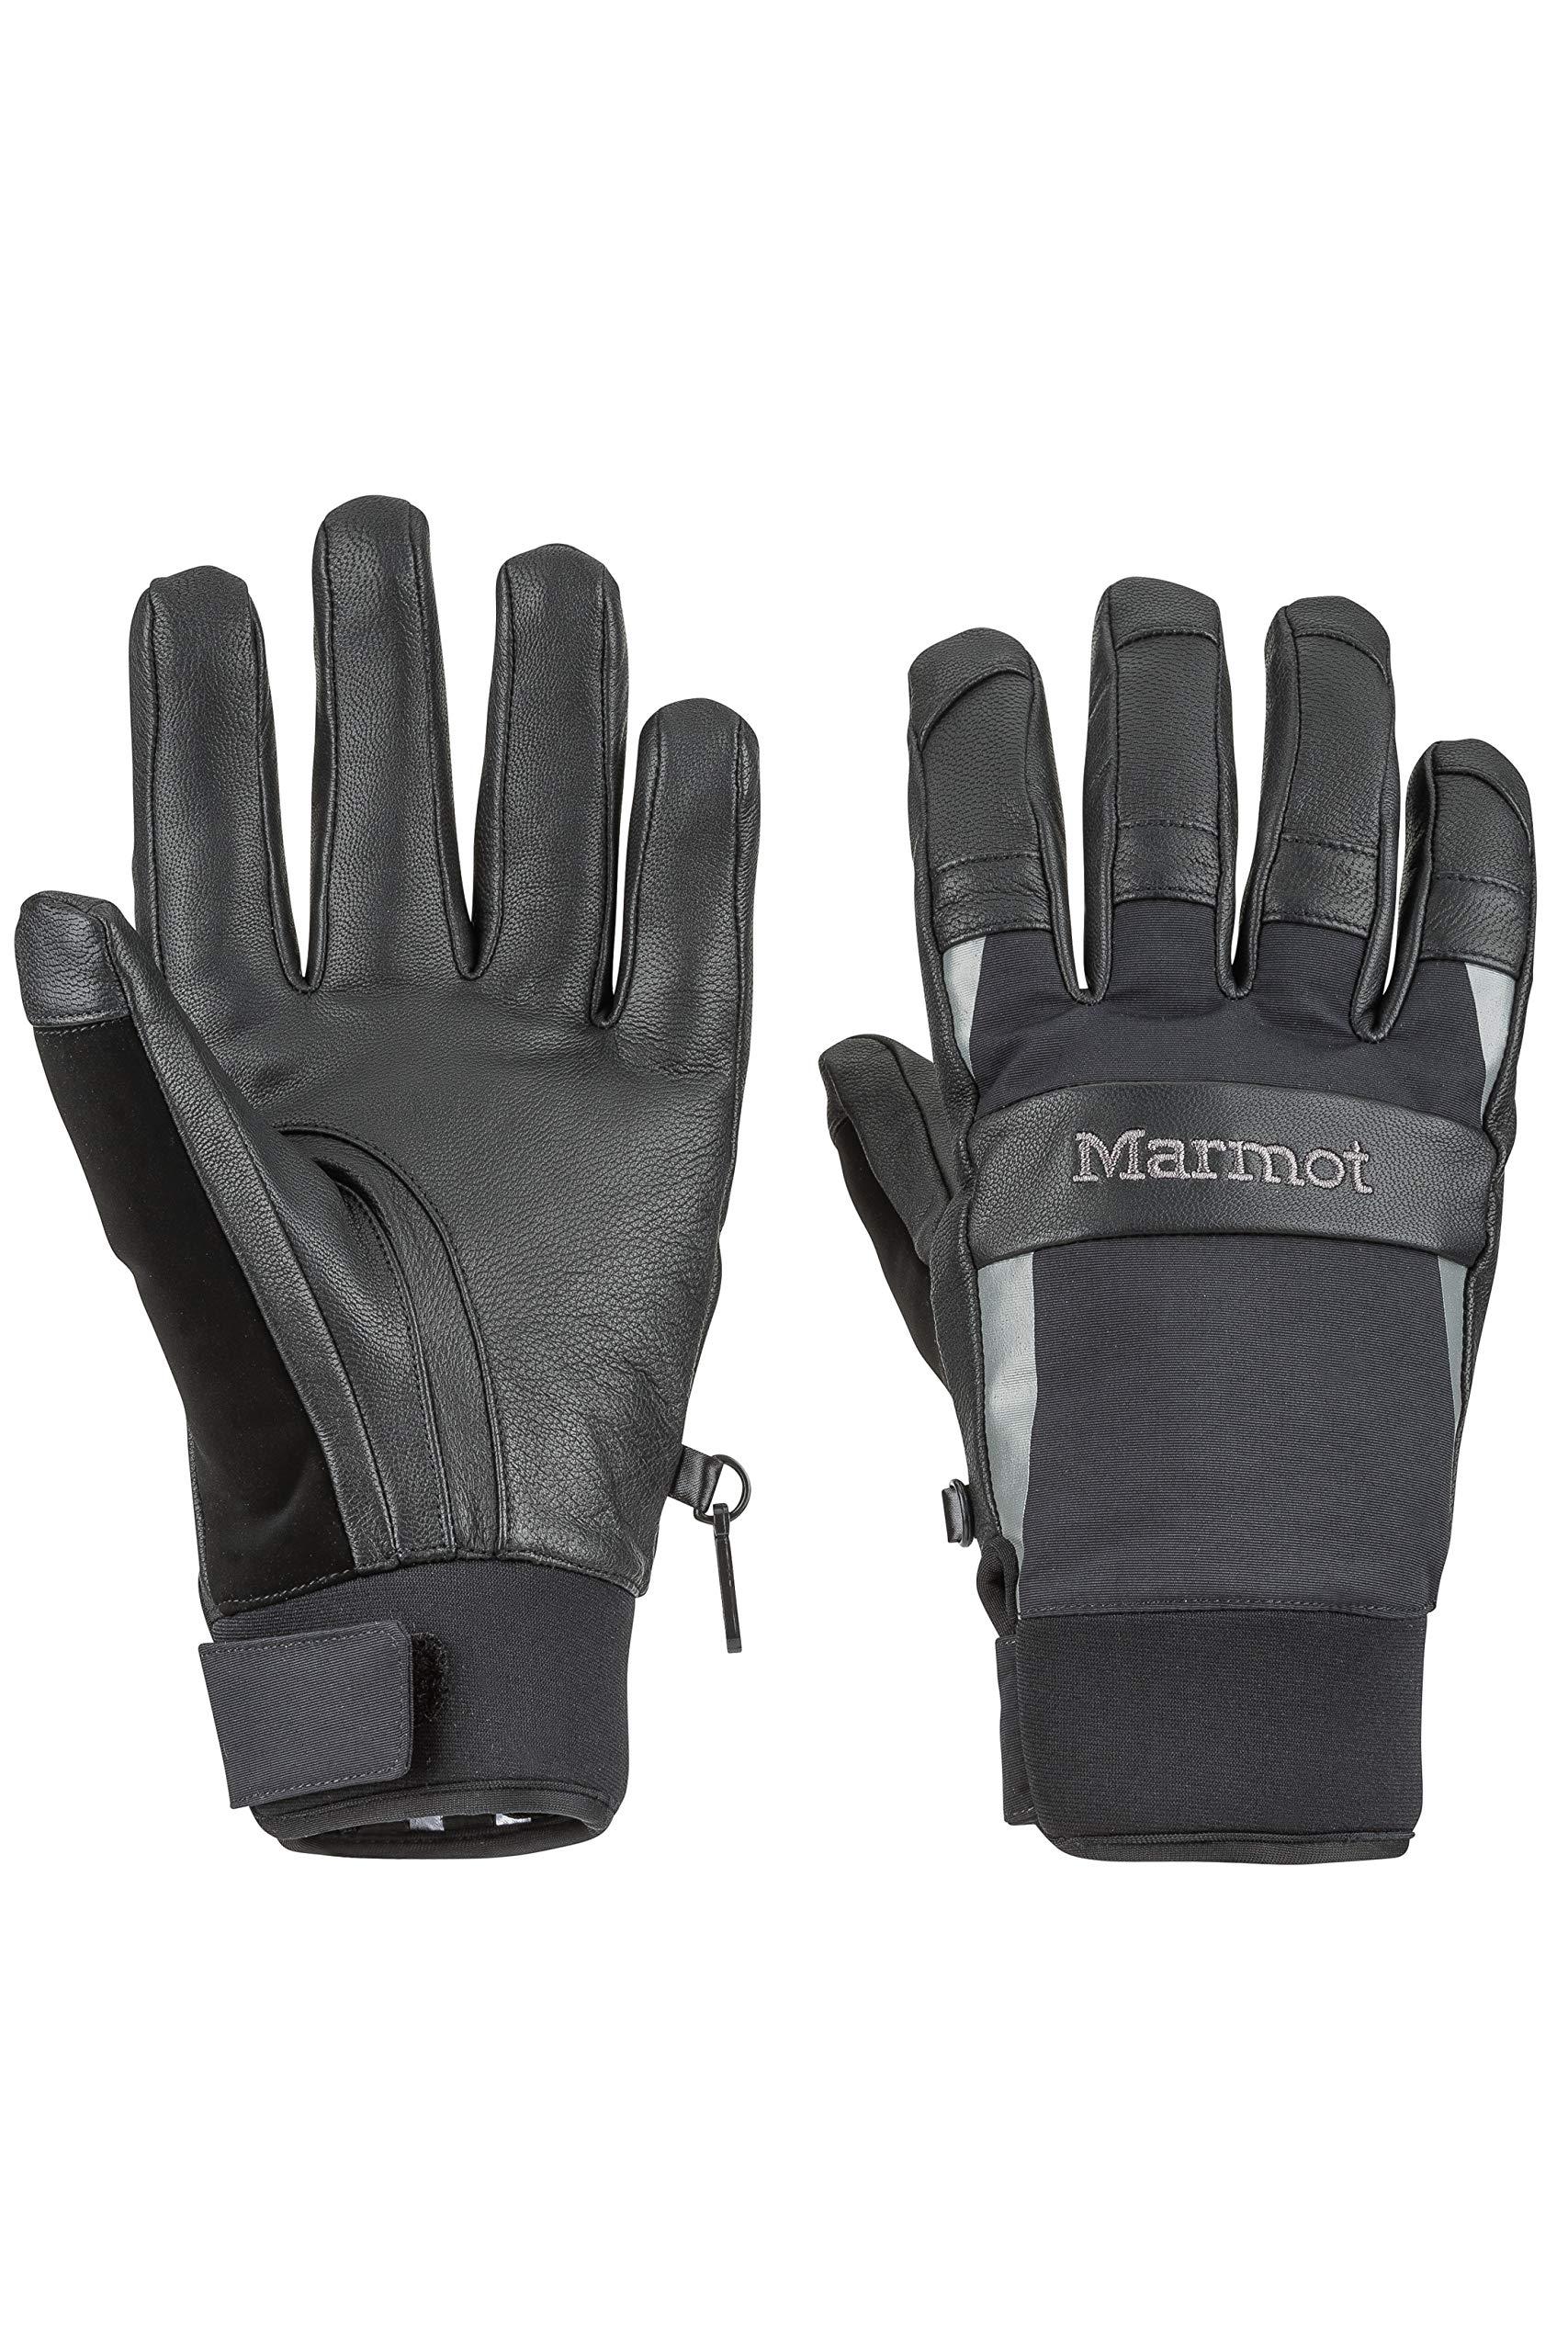 Marmot Men's Spring Glove